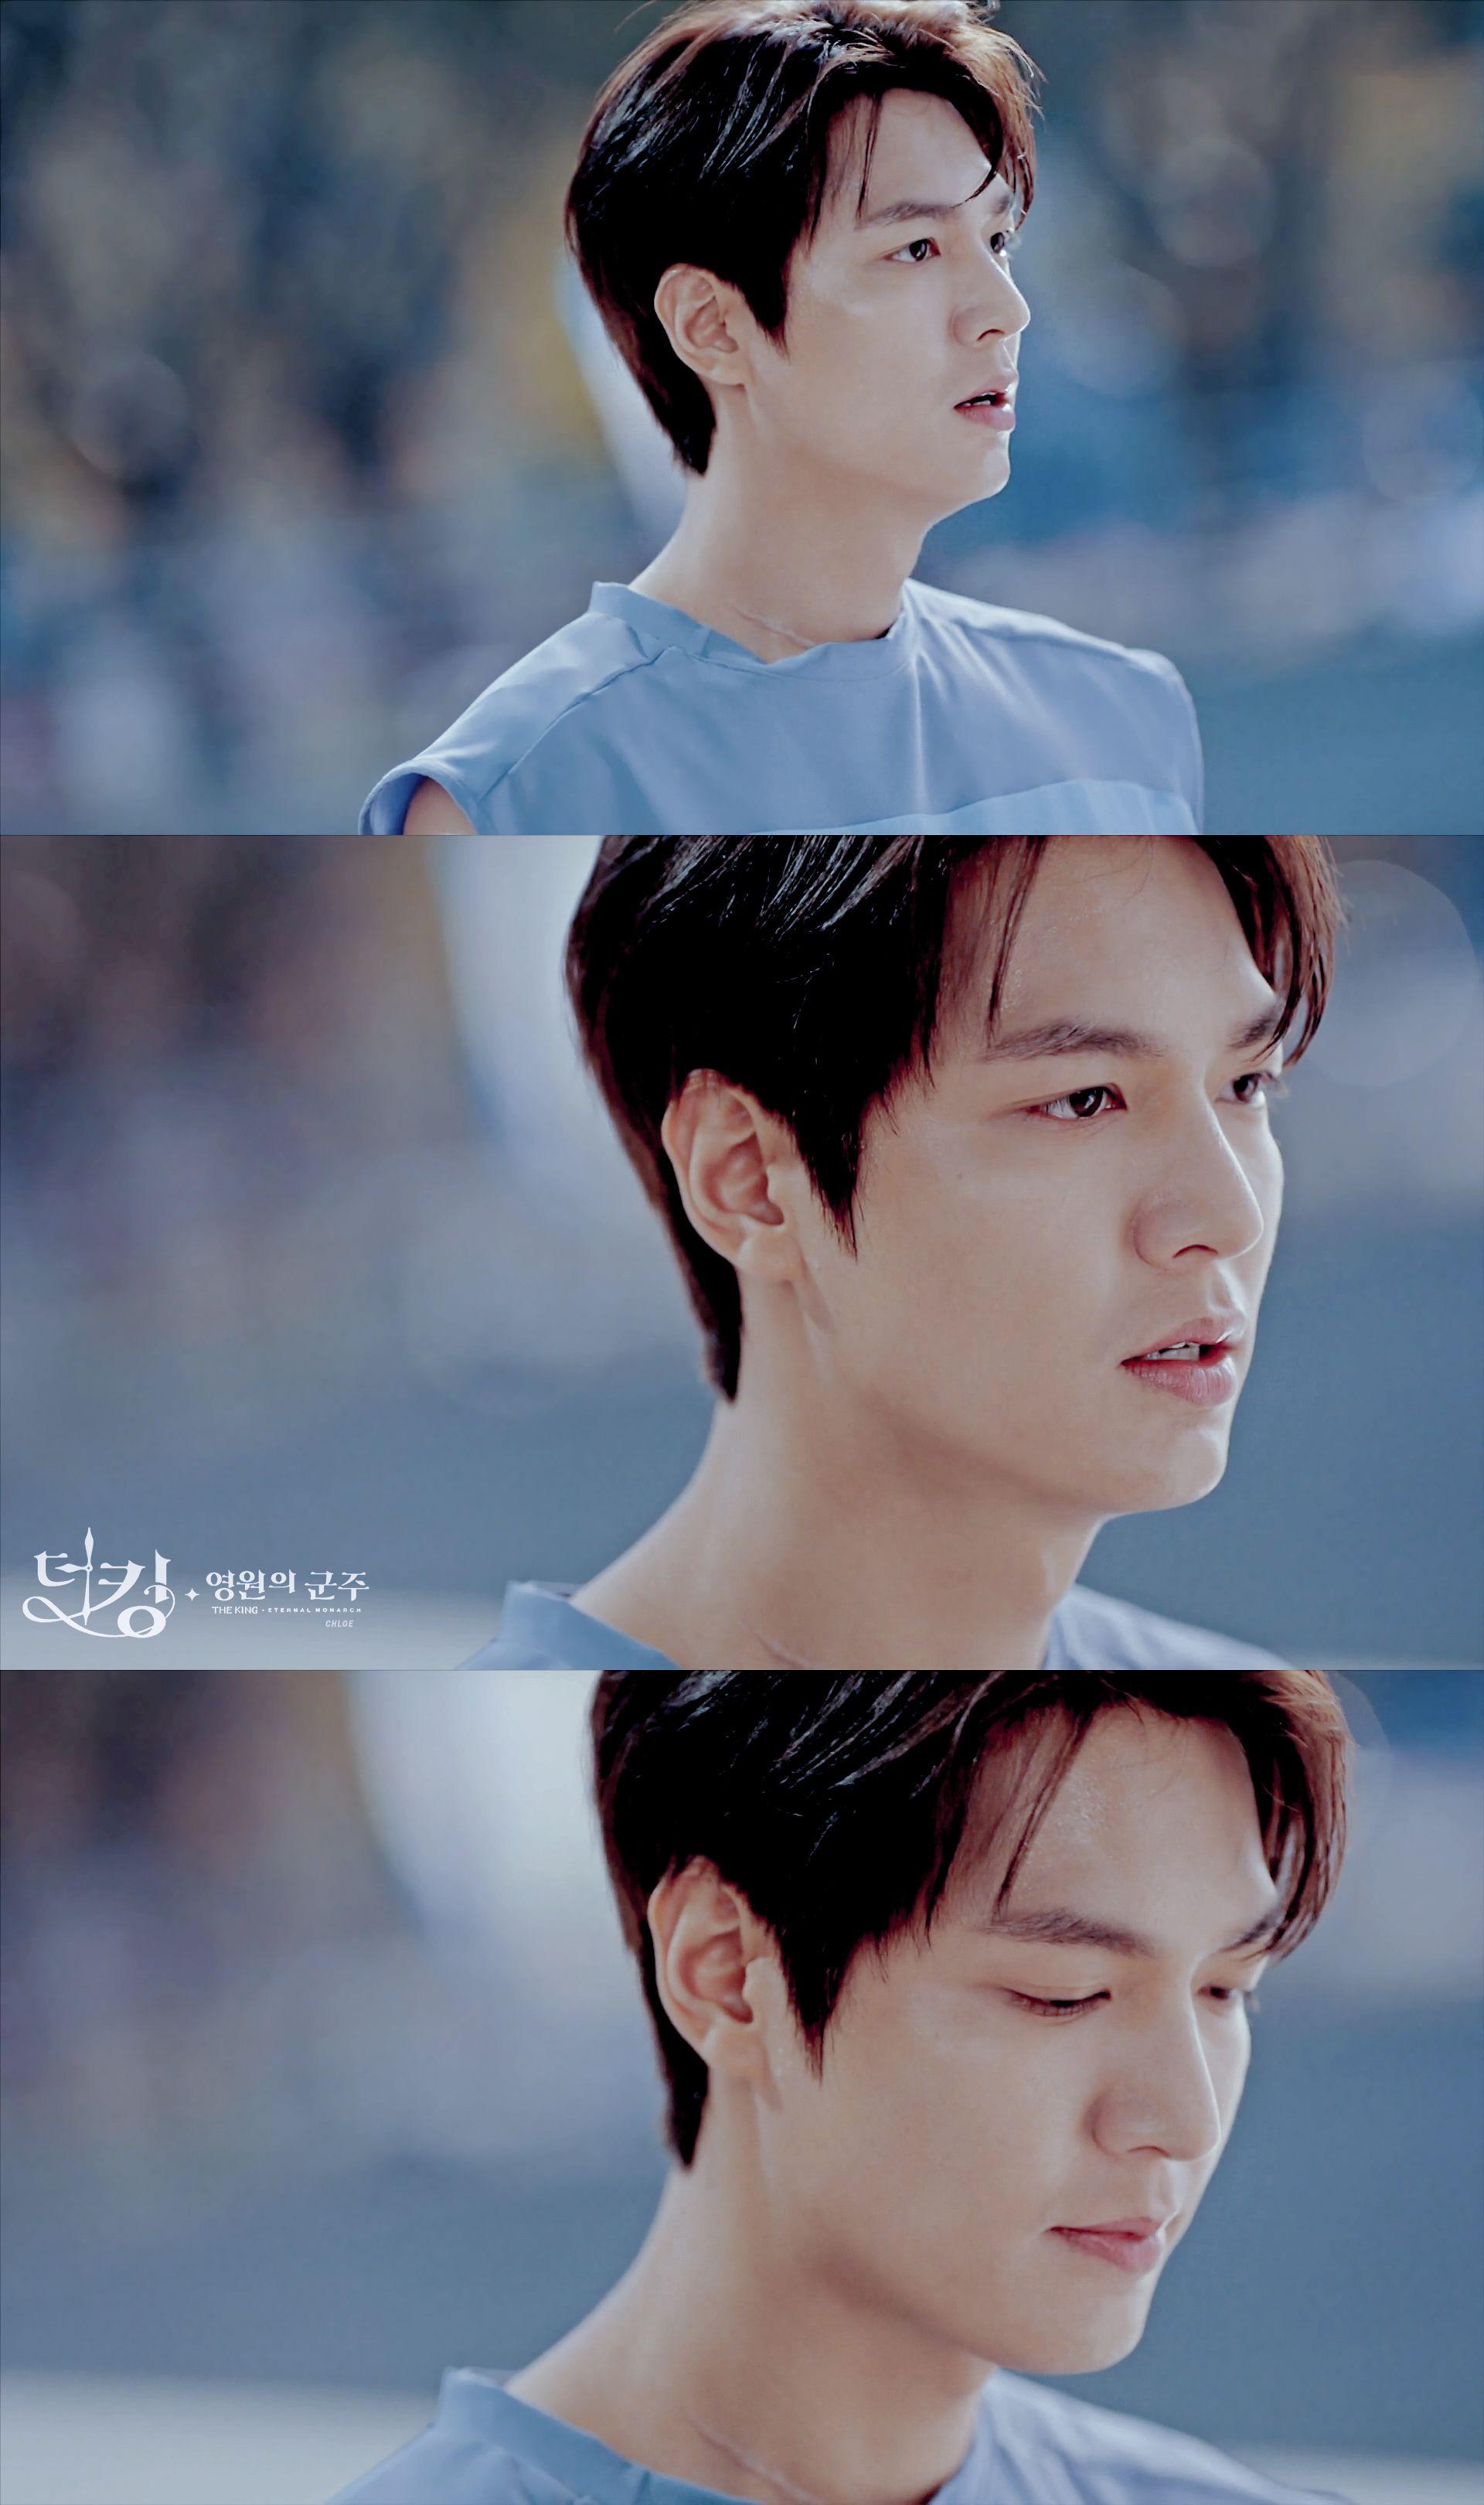 Lee Min Ho The King 2020